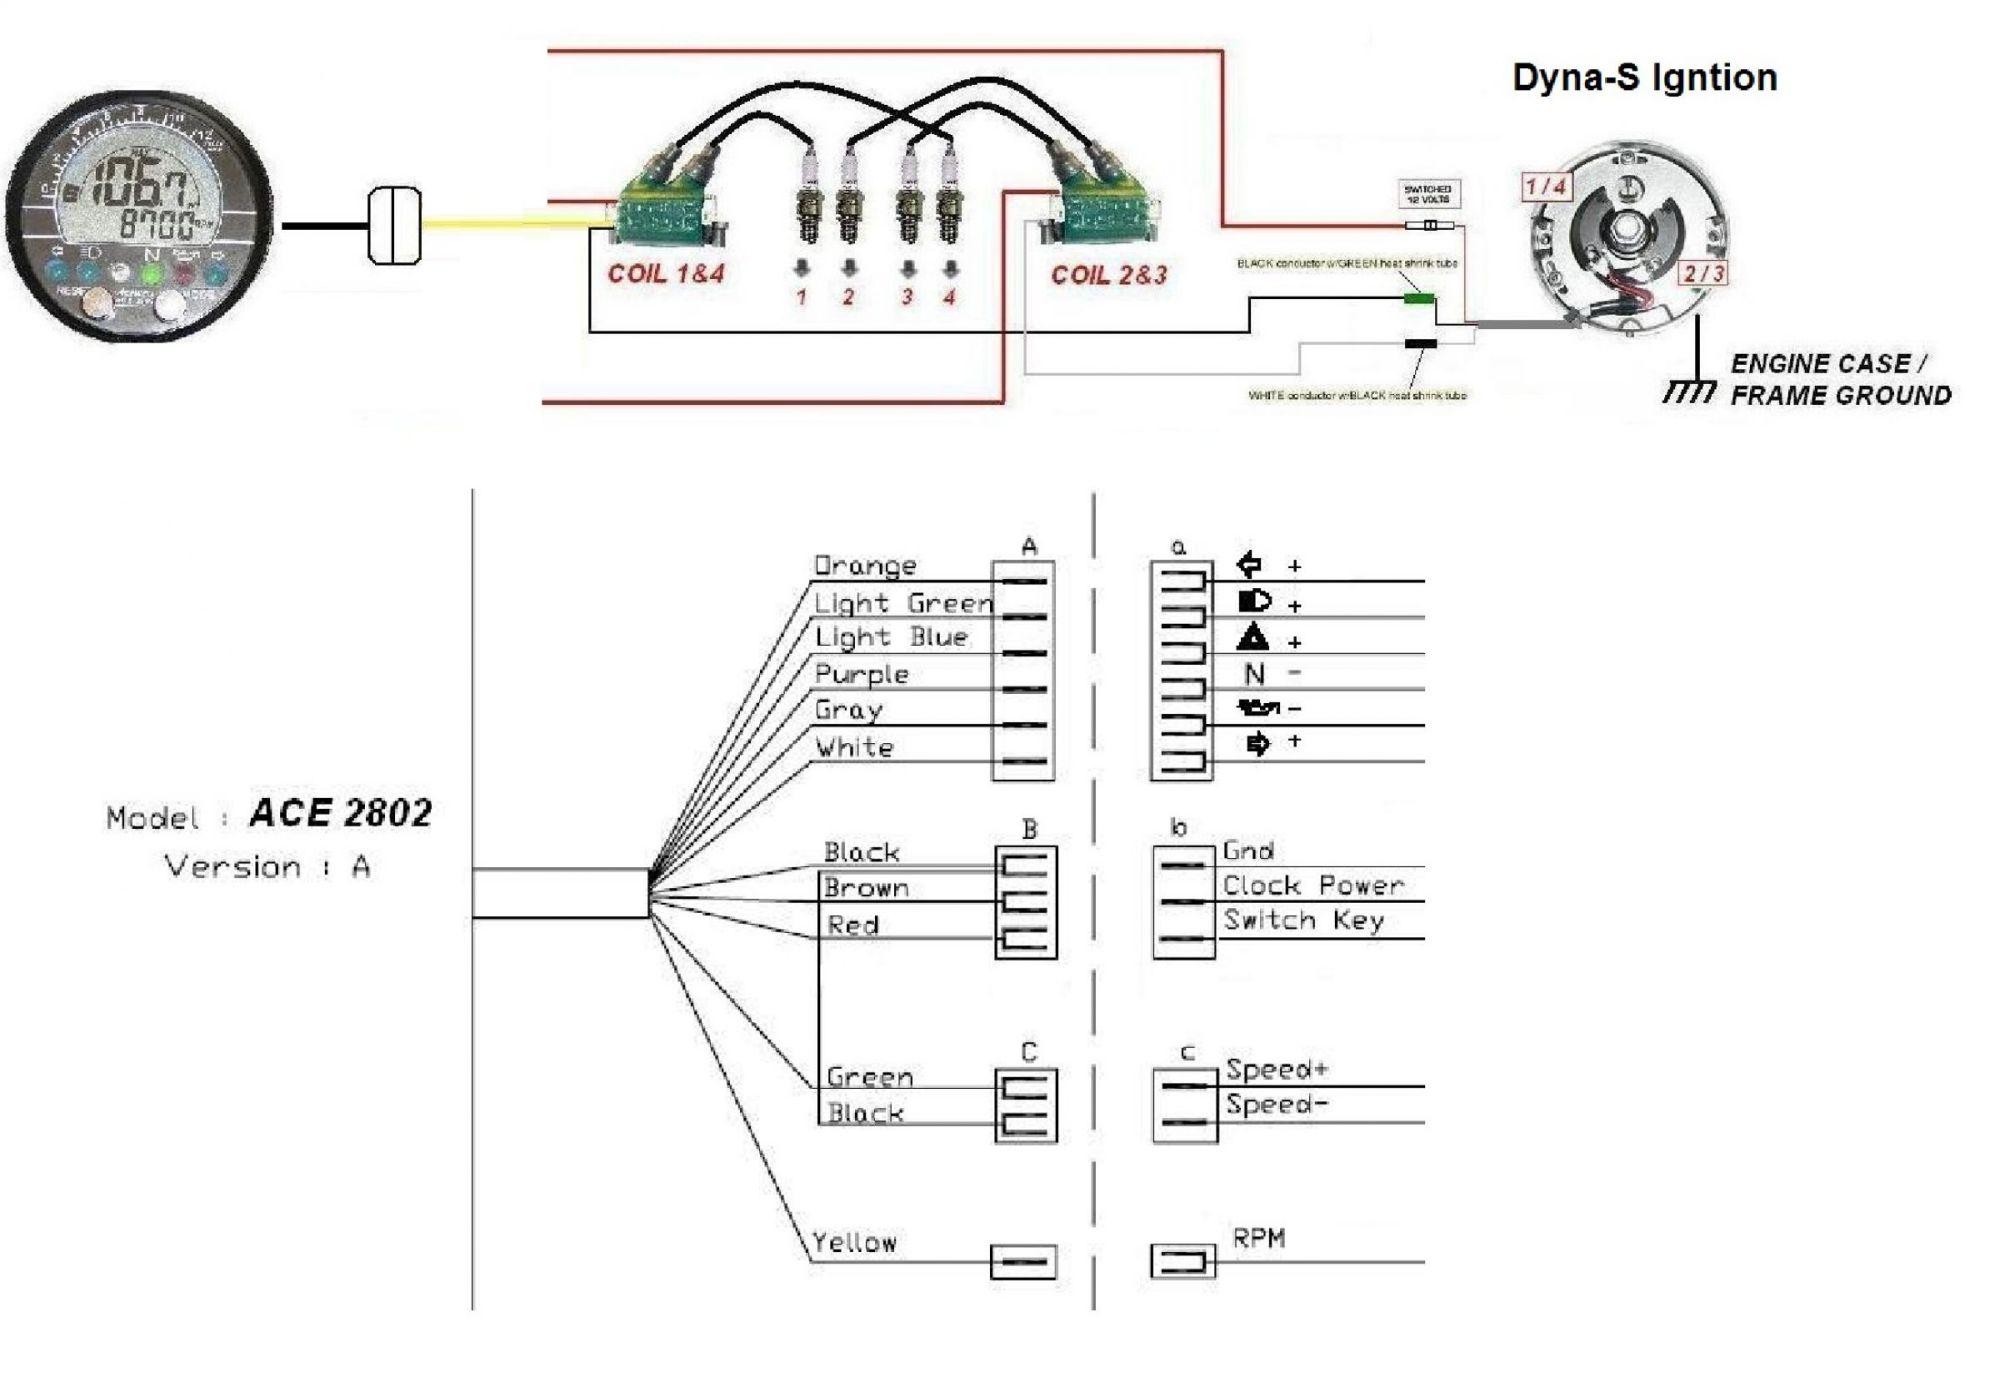 hight resolution of acewell wiring diagram wiring schematic diagram 95 fiercemc cokz1300 wiring diagram wiring library ford wiring diagrams